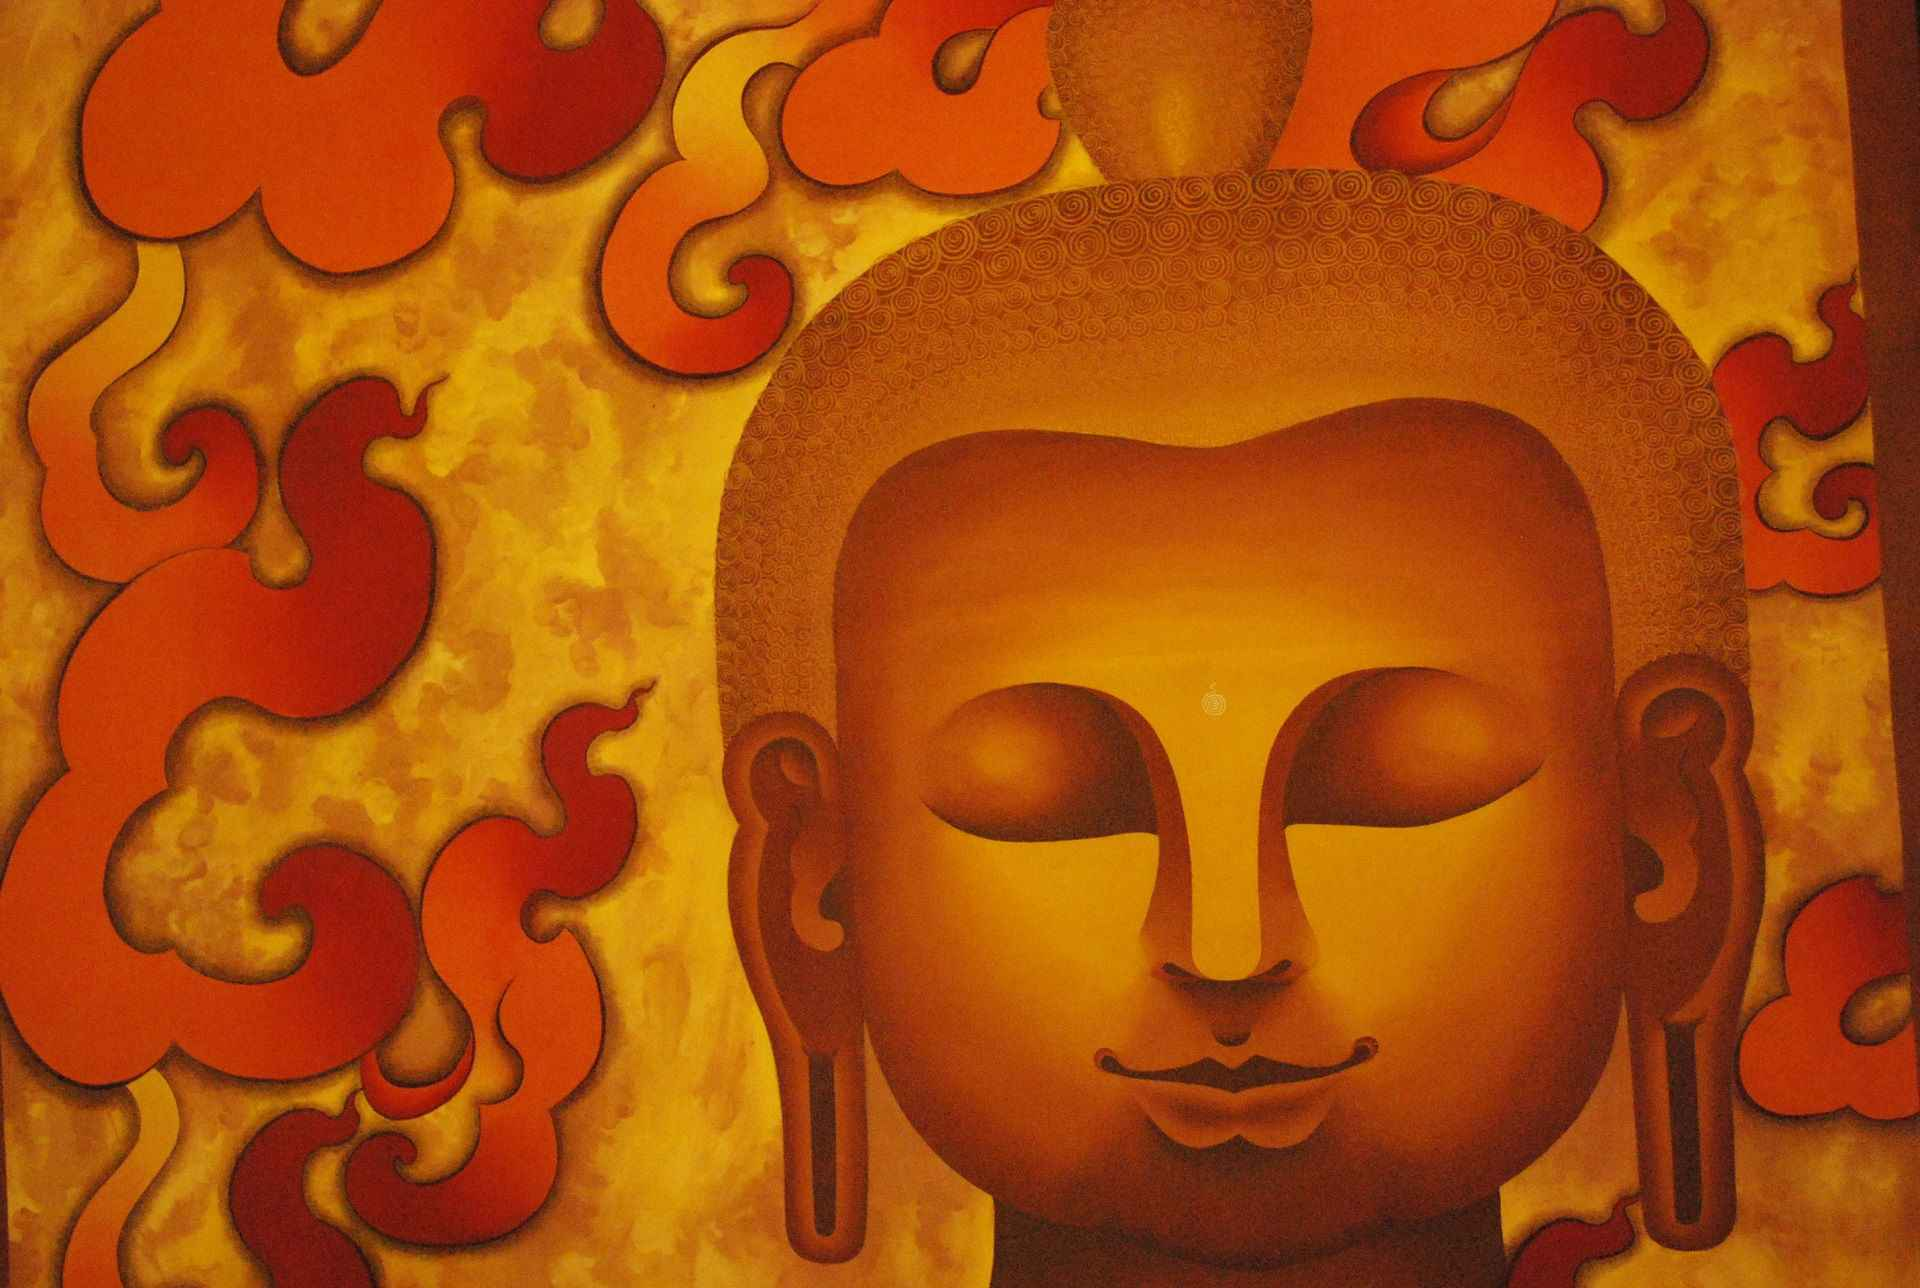 Buddhism Wallpaper 032